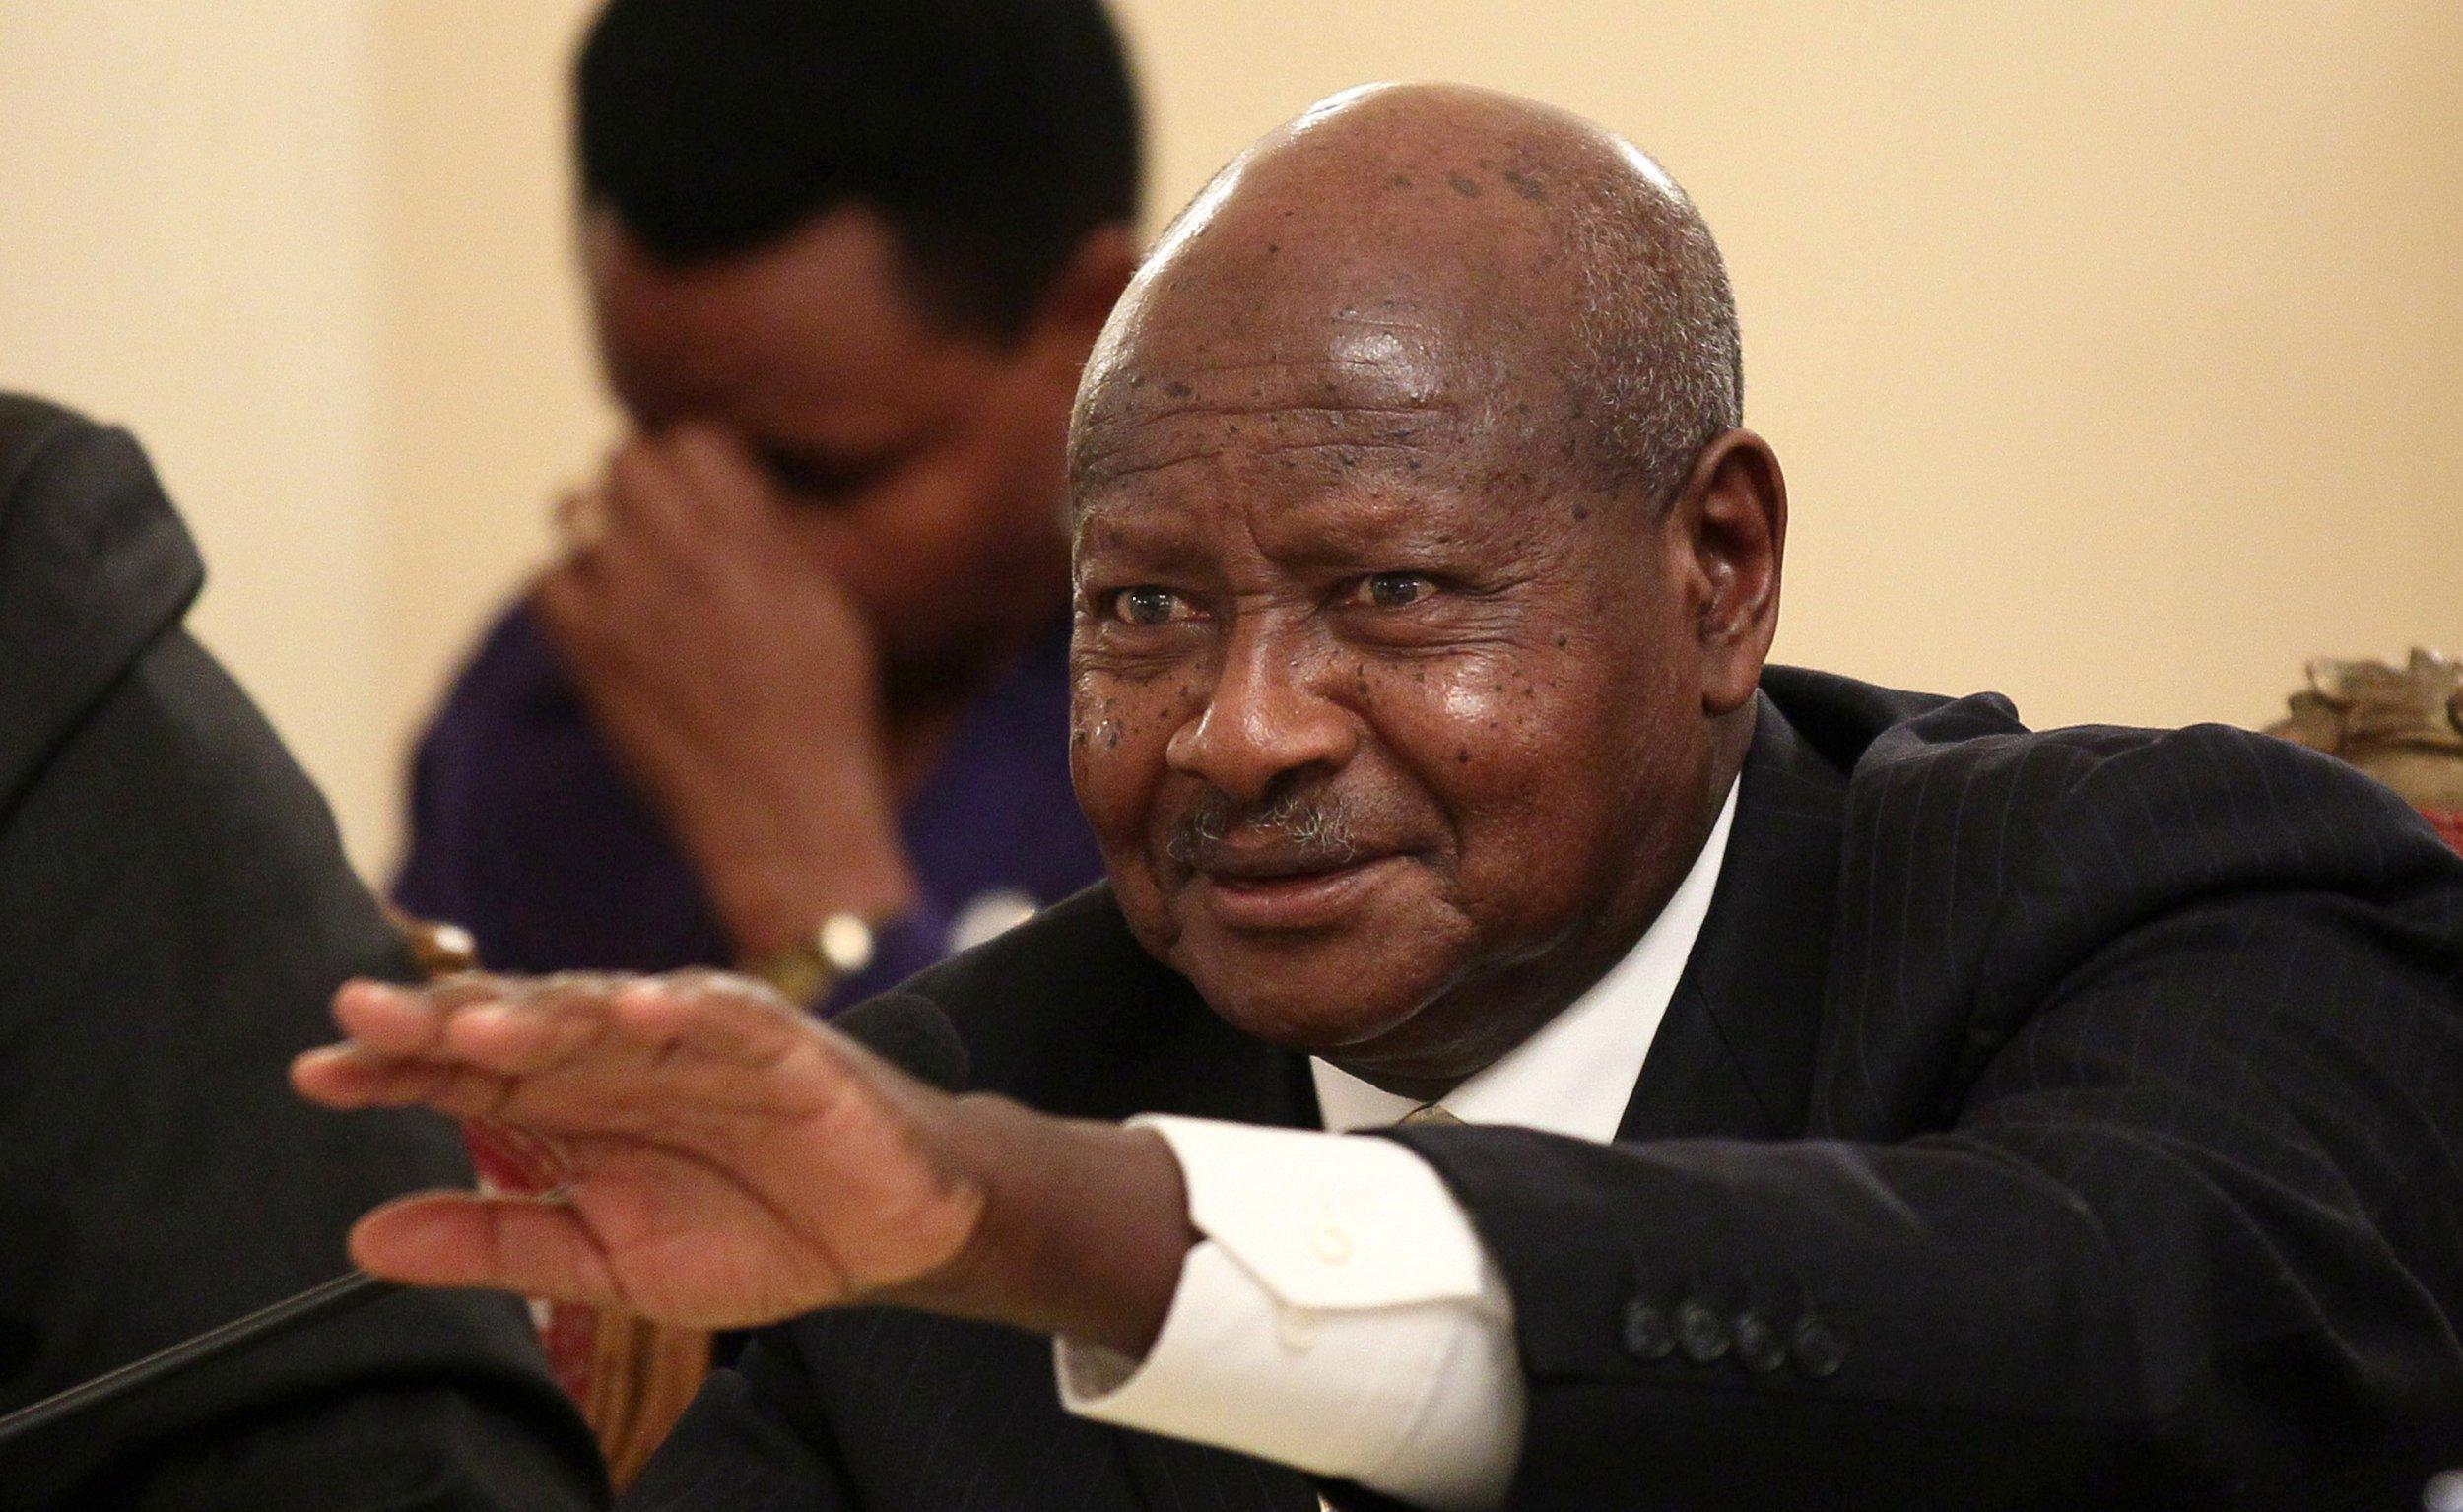 Ugandan President Yoweri Museveni addresses a news conference in Addis Ababa.